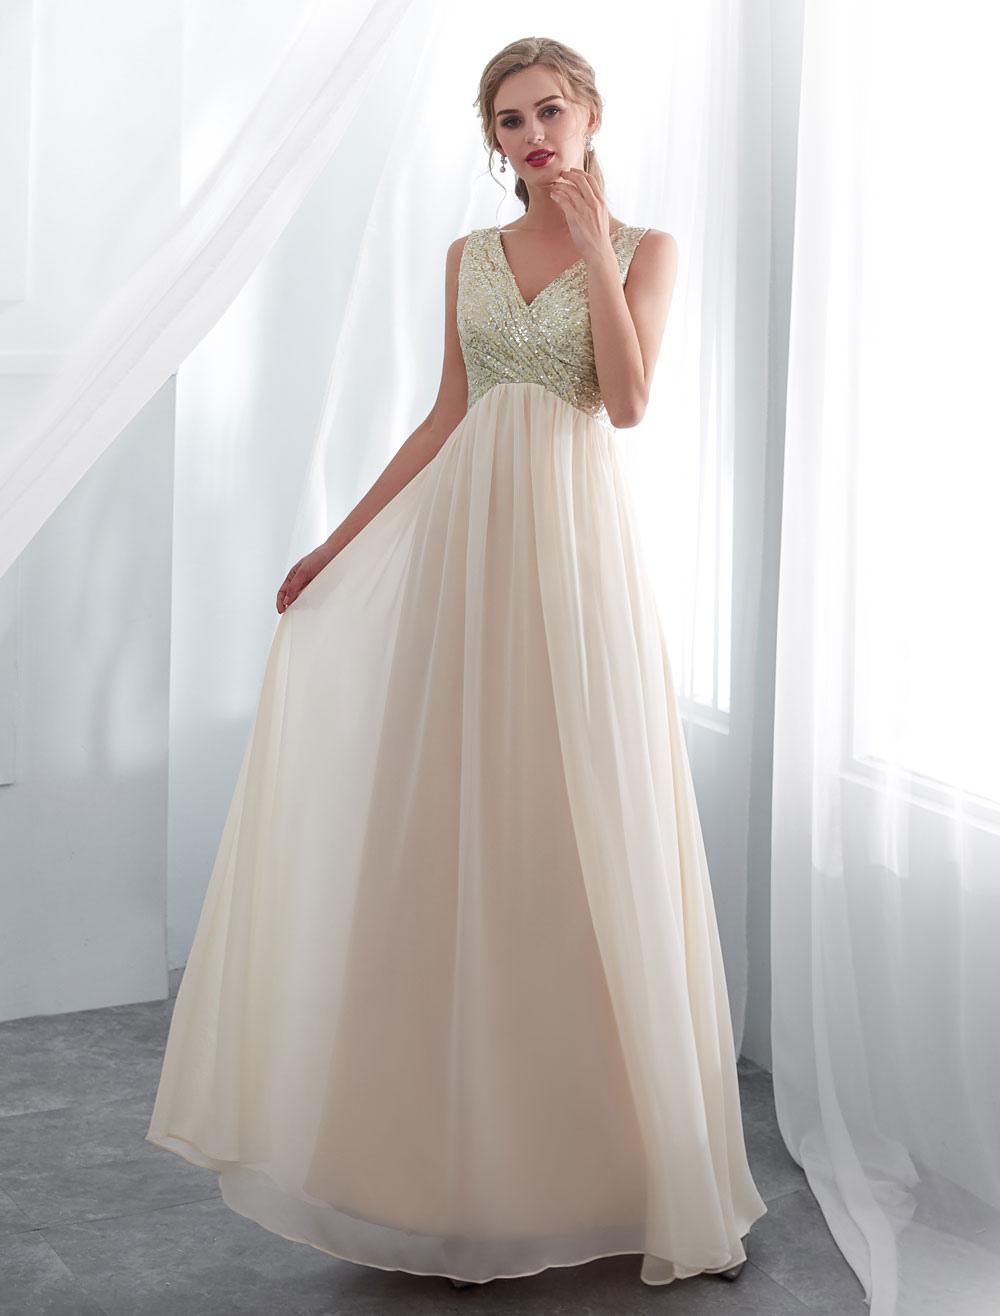 Prom Dresses Long Champagne Bridesmaid Dress Sequin Chiffon Maxi Formal Dress